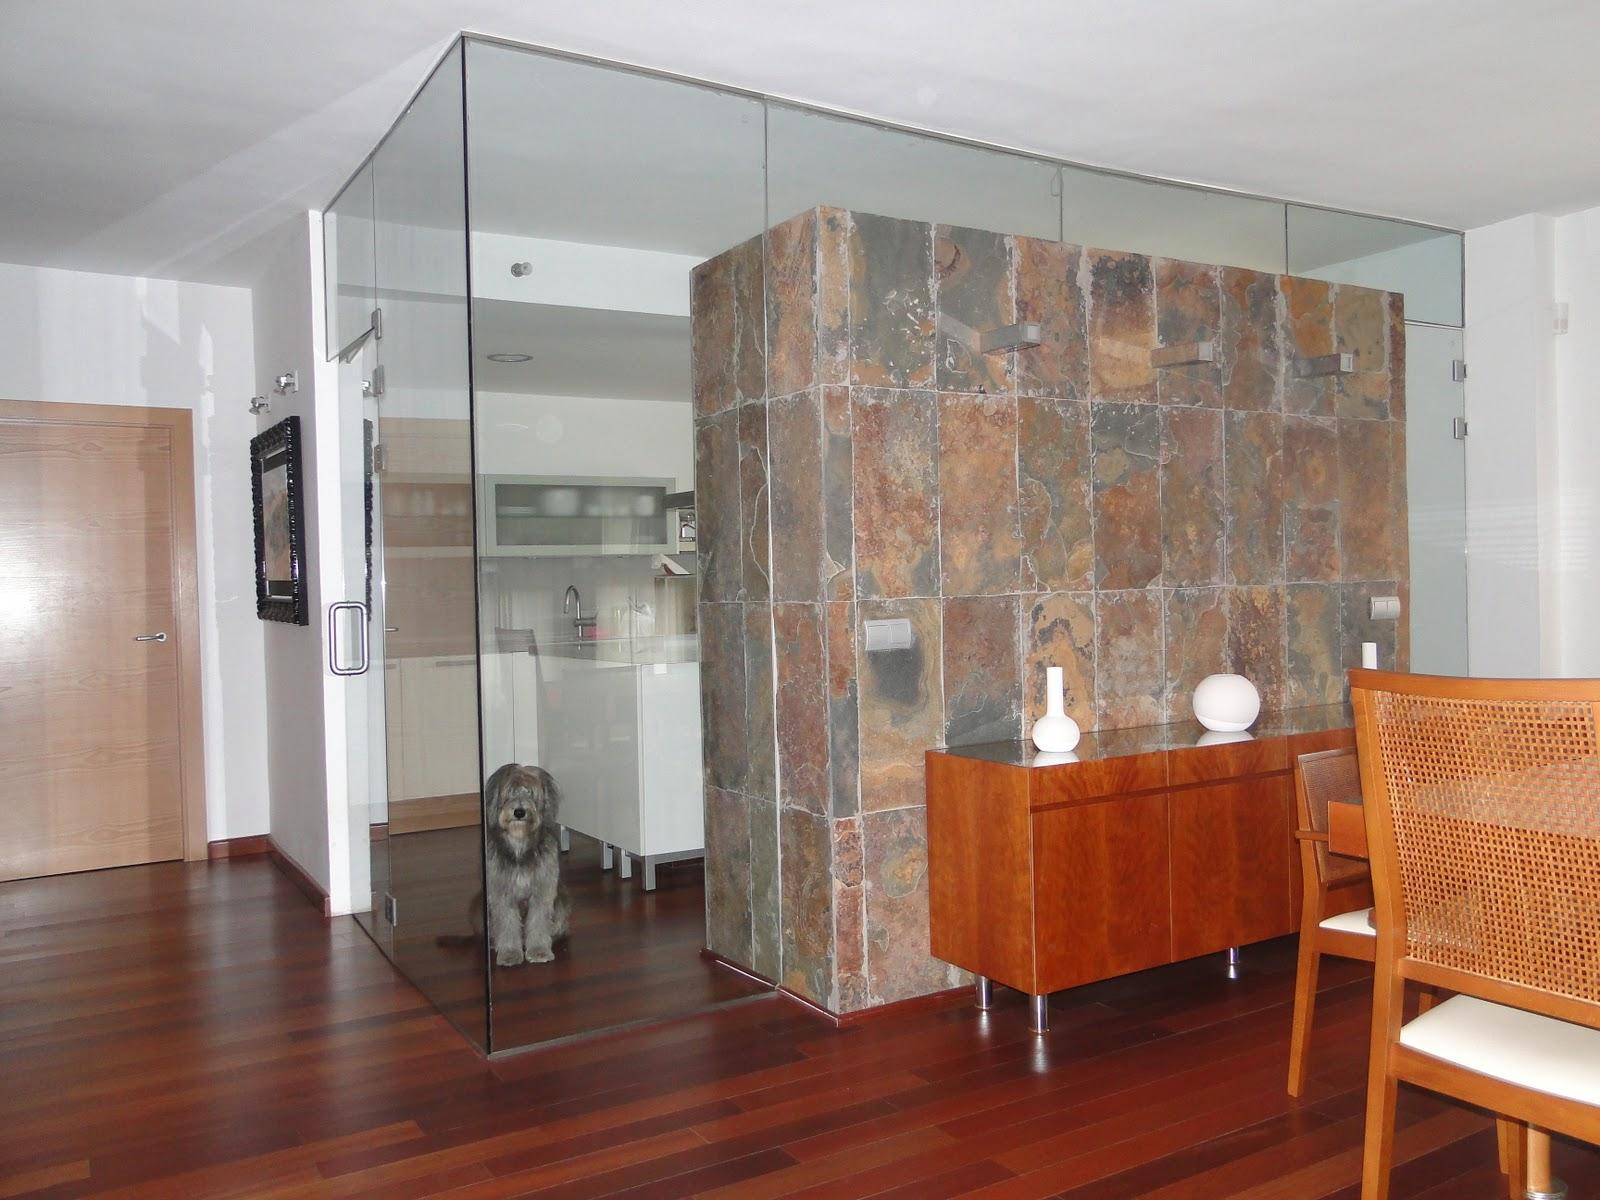 Planos low cost comedor sal n en dos niveles - Cocina salon separados cristal ...